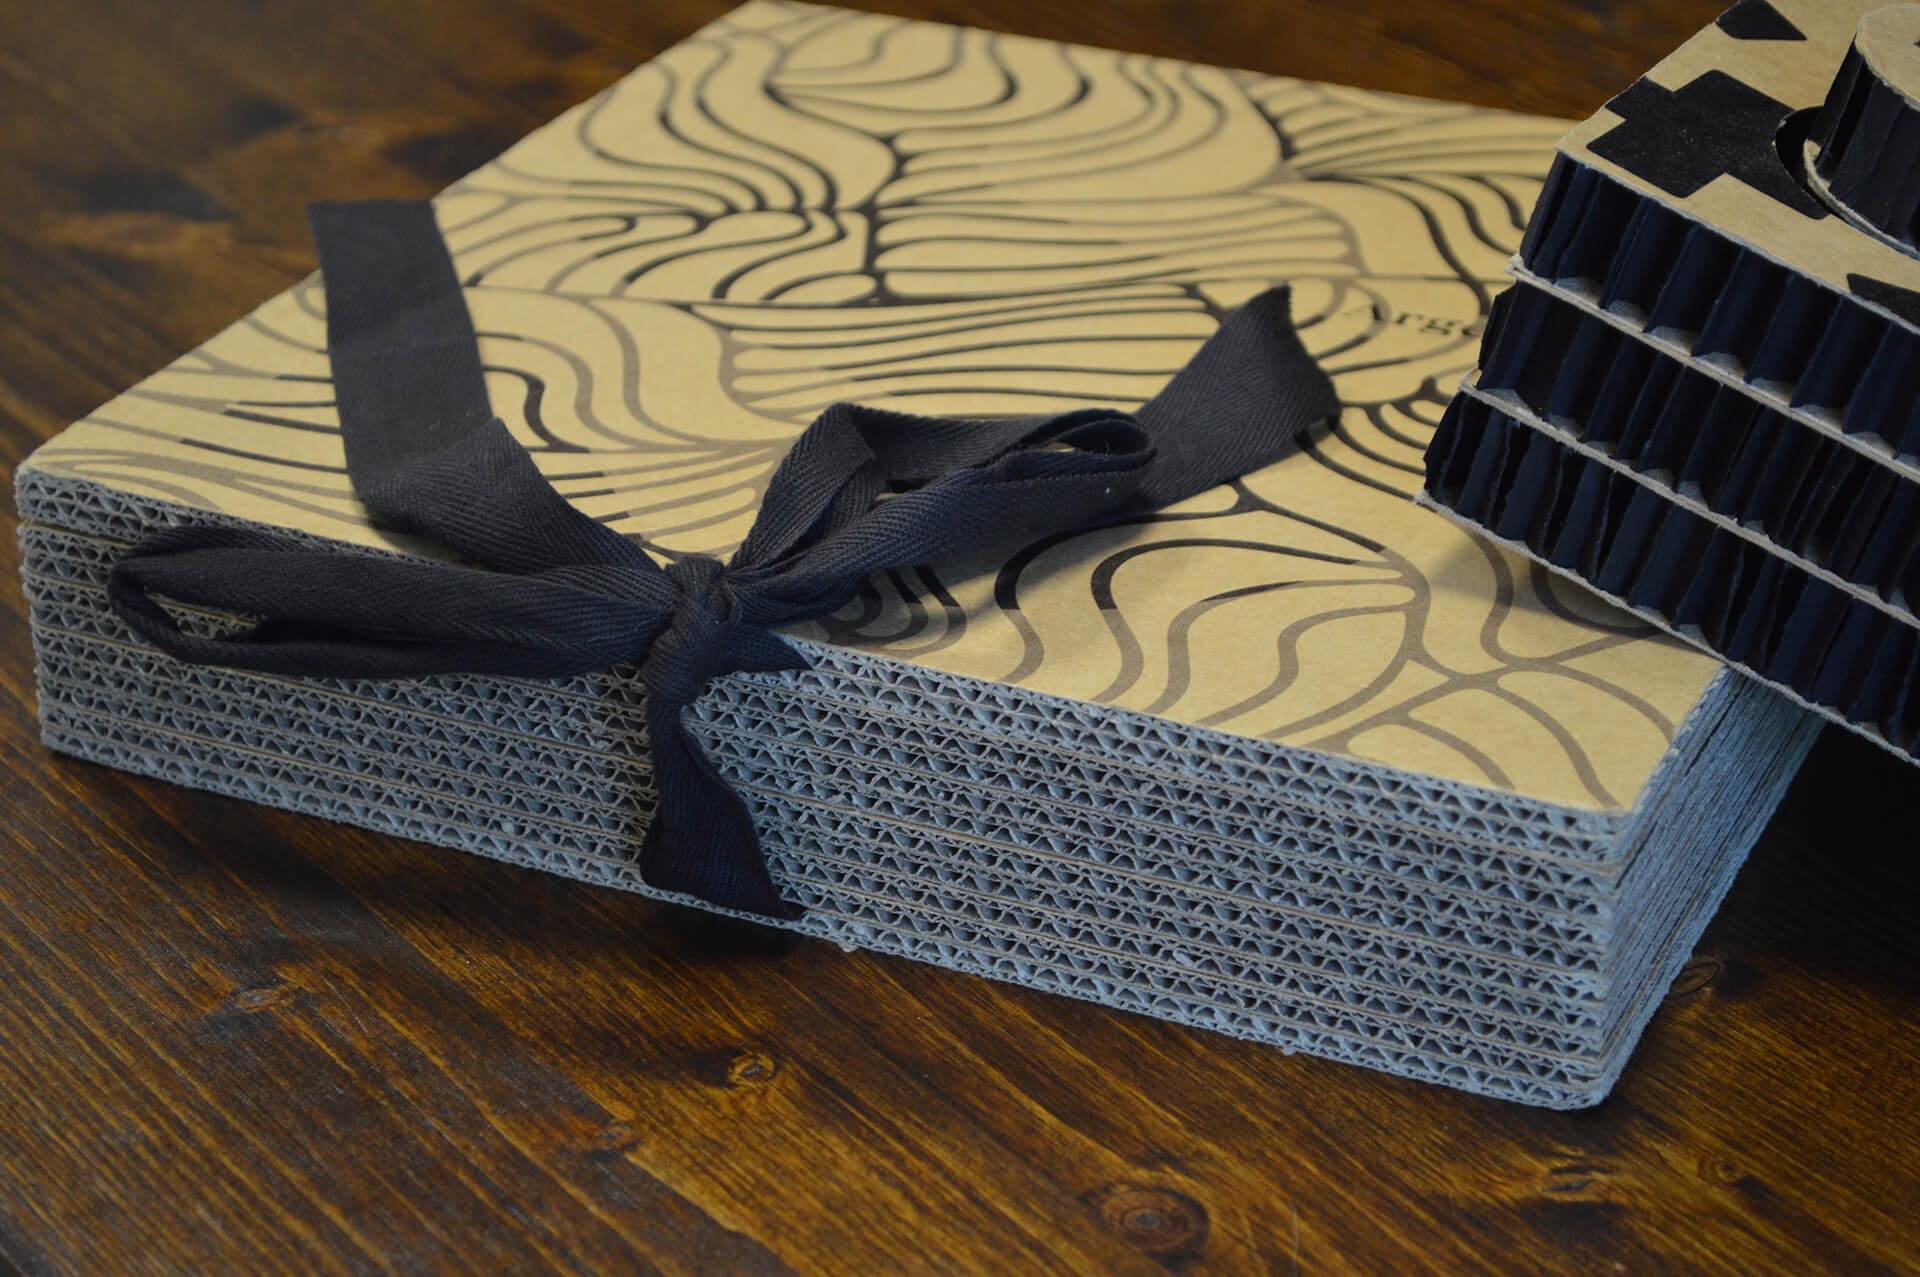 GRAFOX - Packaging